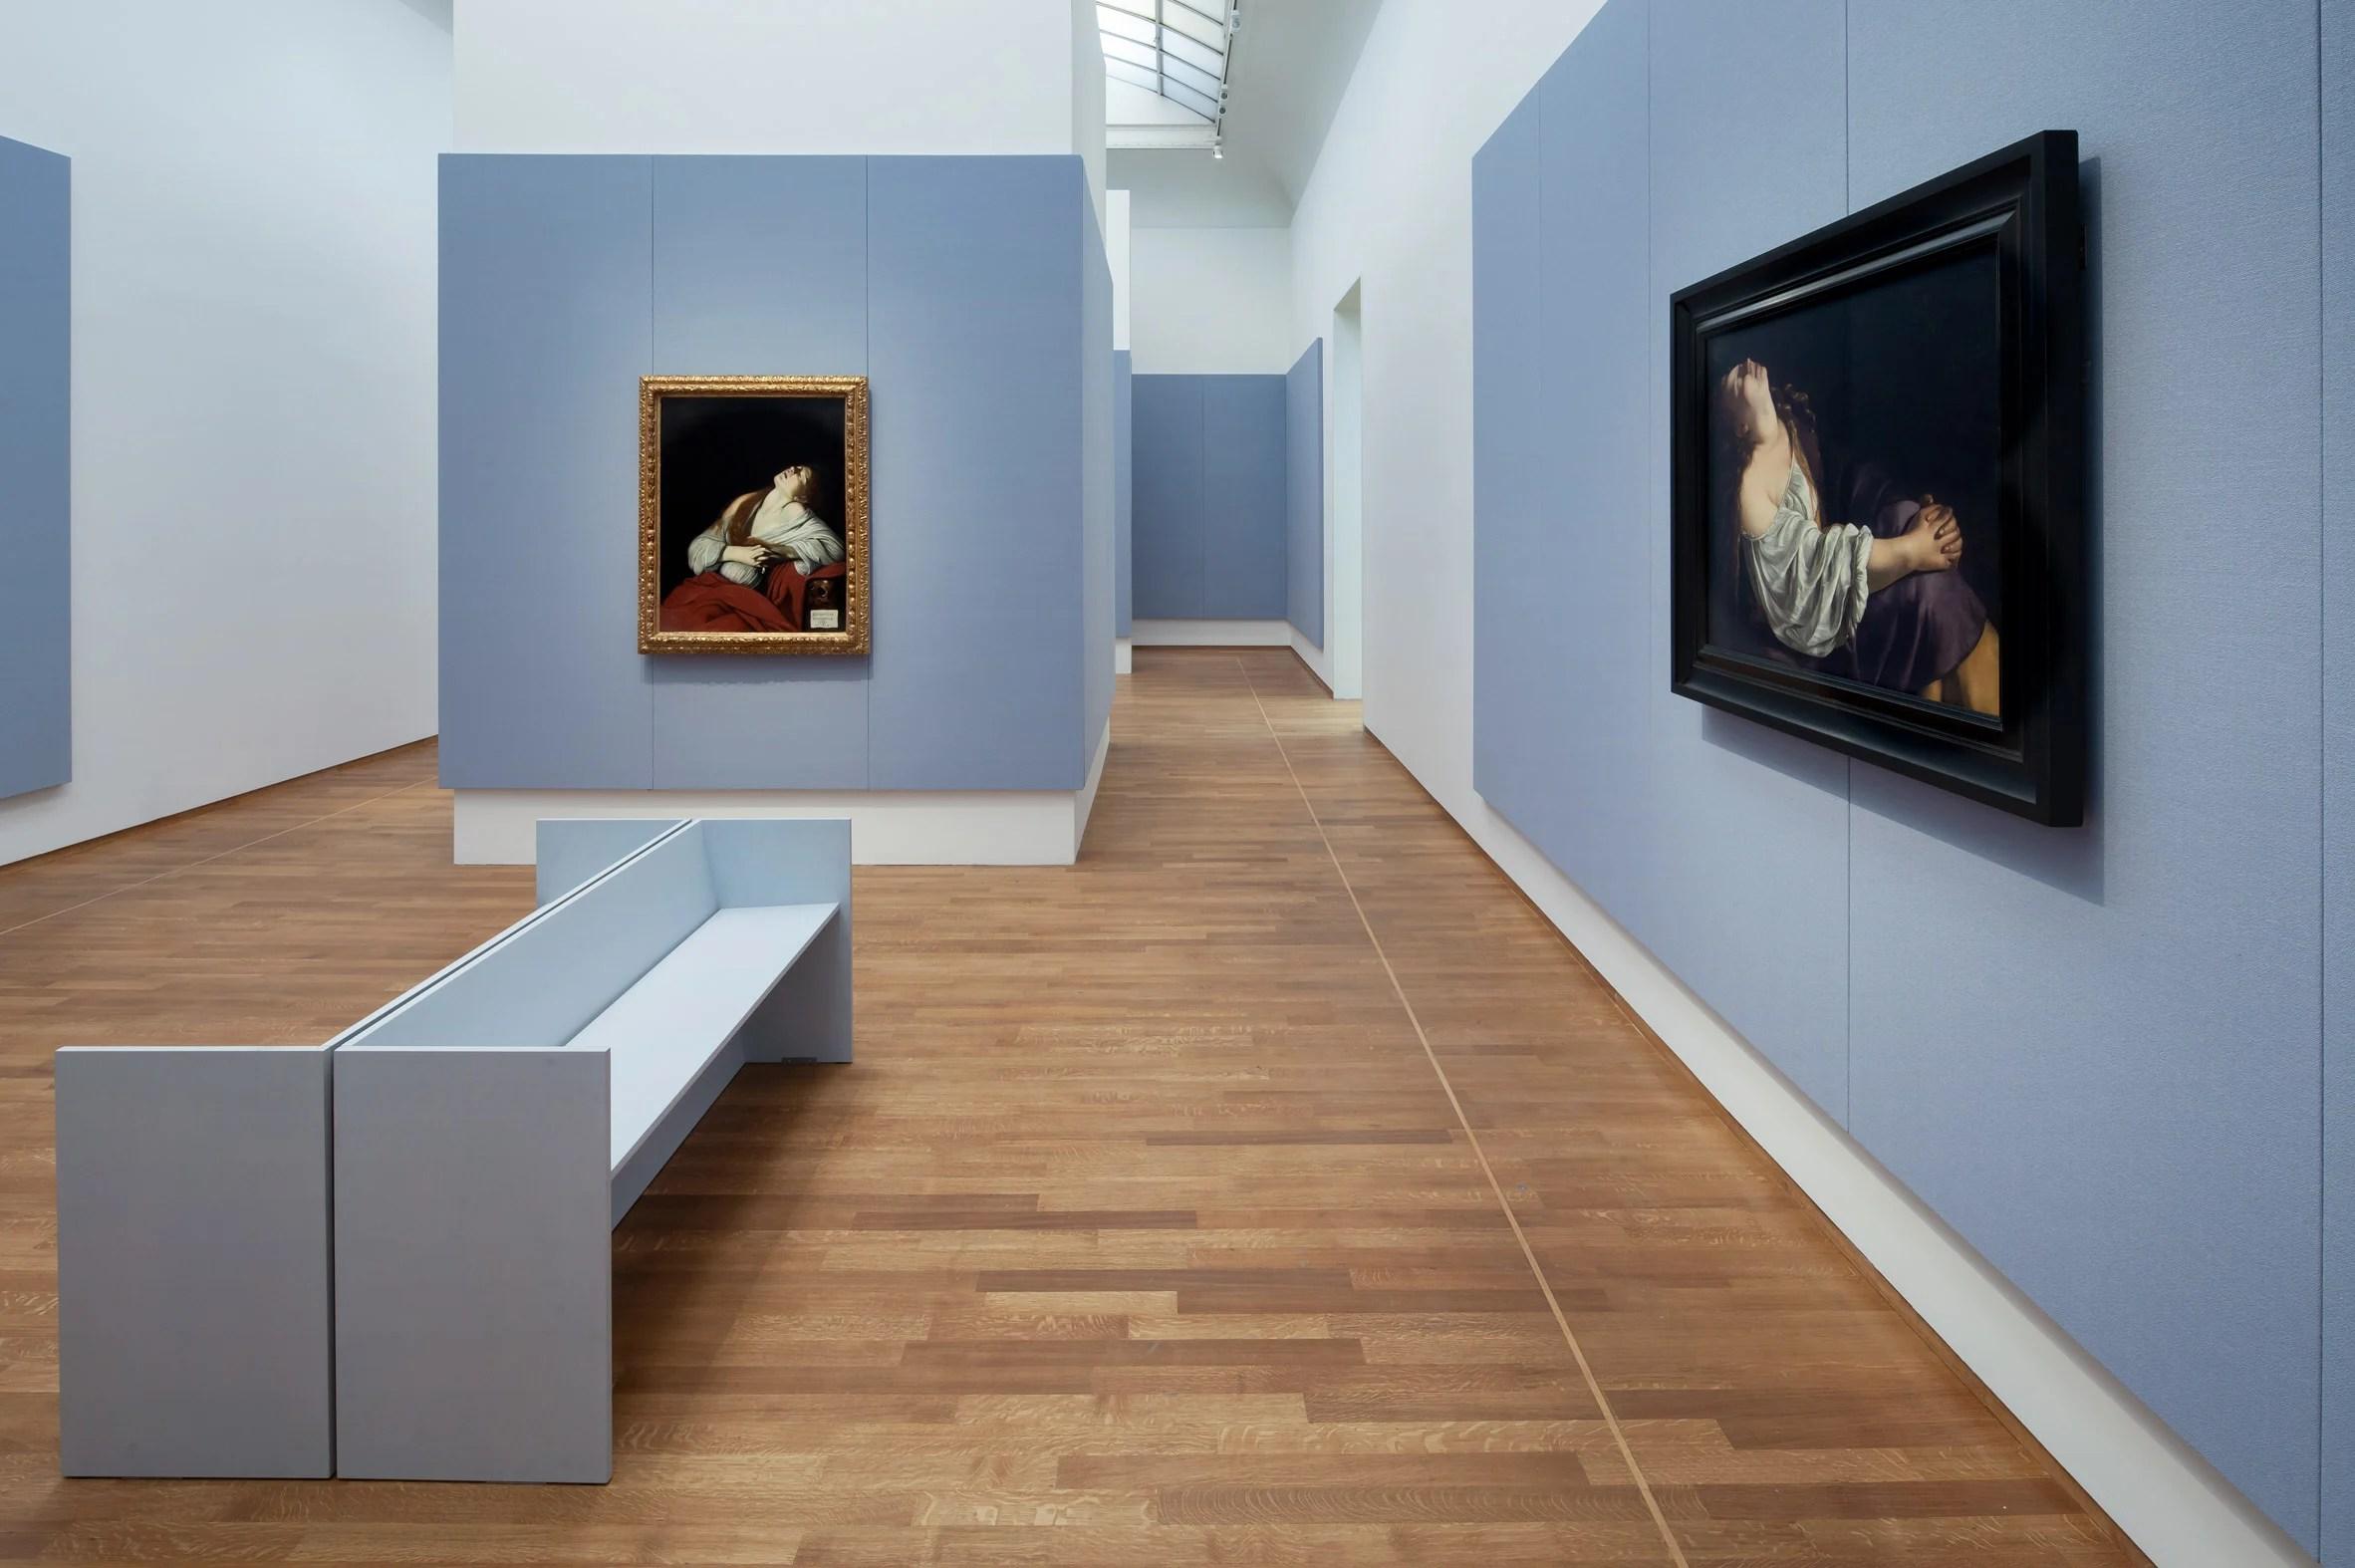 Baroque in Rome by Formafantasma at the Rijksmuseum